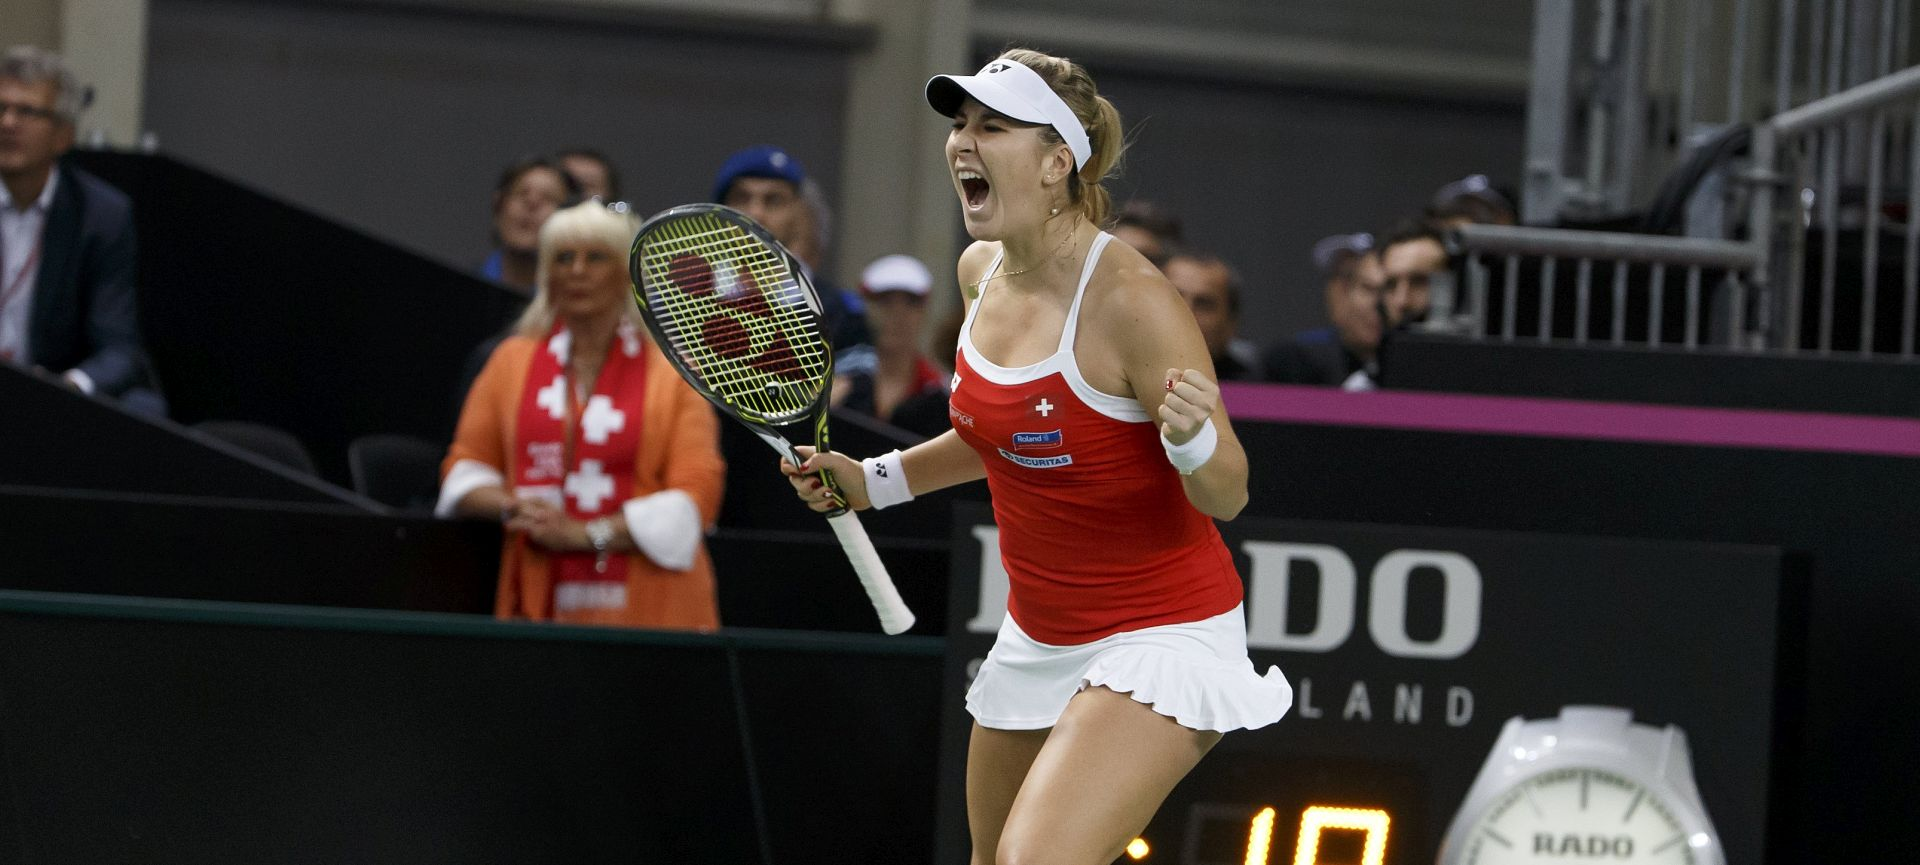 FED CUP Belinda Benčić odvela Švicarsku u polufinale